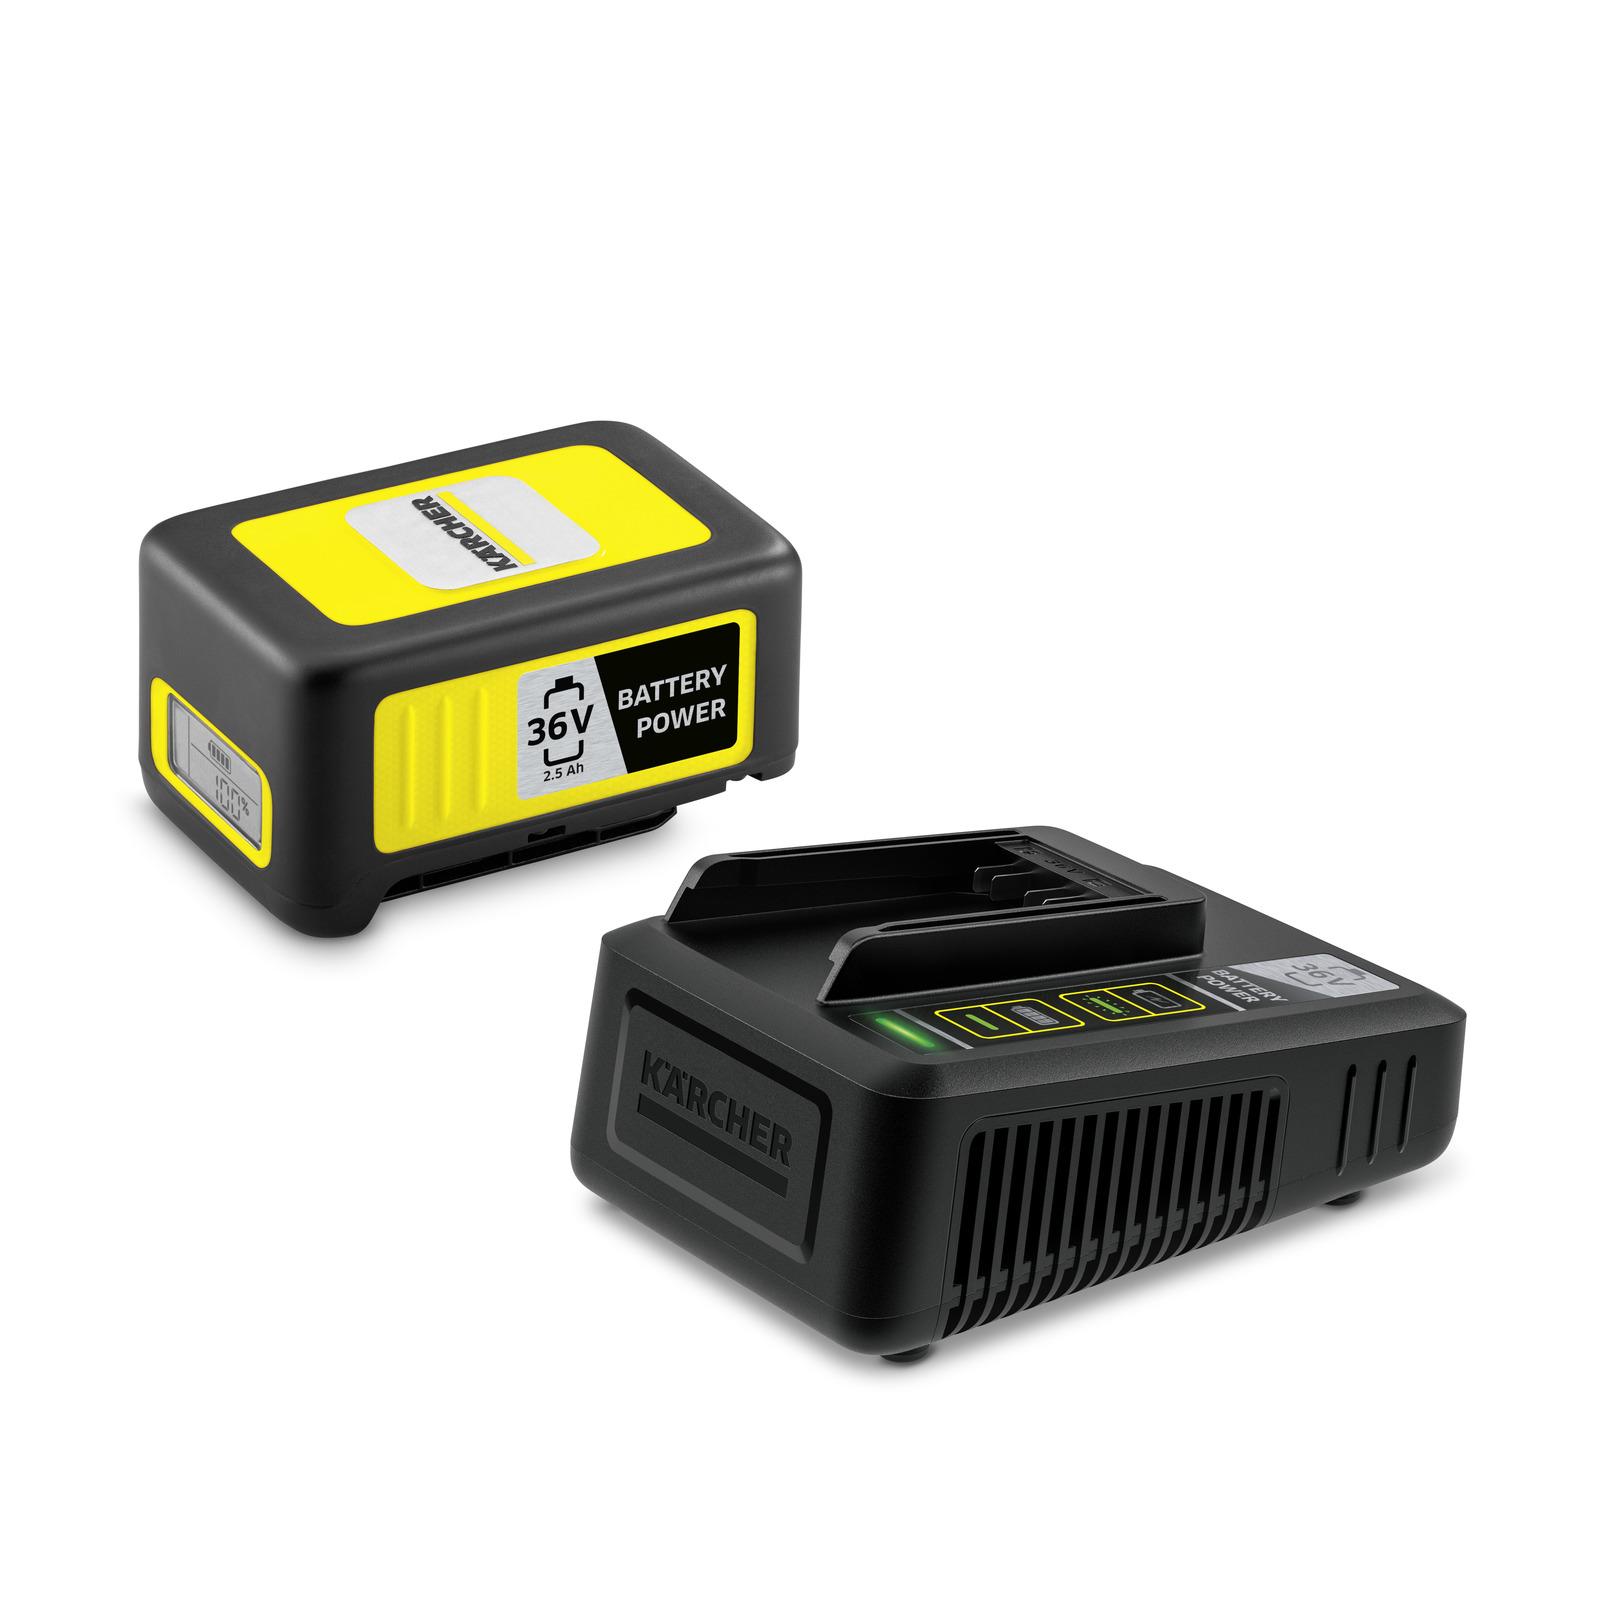 Комплект стартовый Karcher power 36/25 аккумулятор зарядное устройство karcher starter kit battery power 36 25 2 445 064